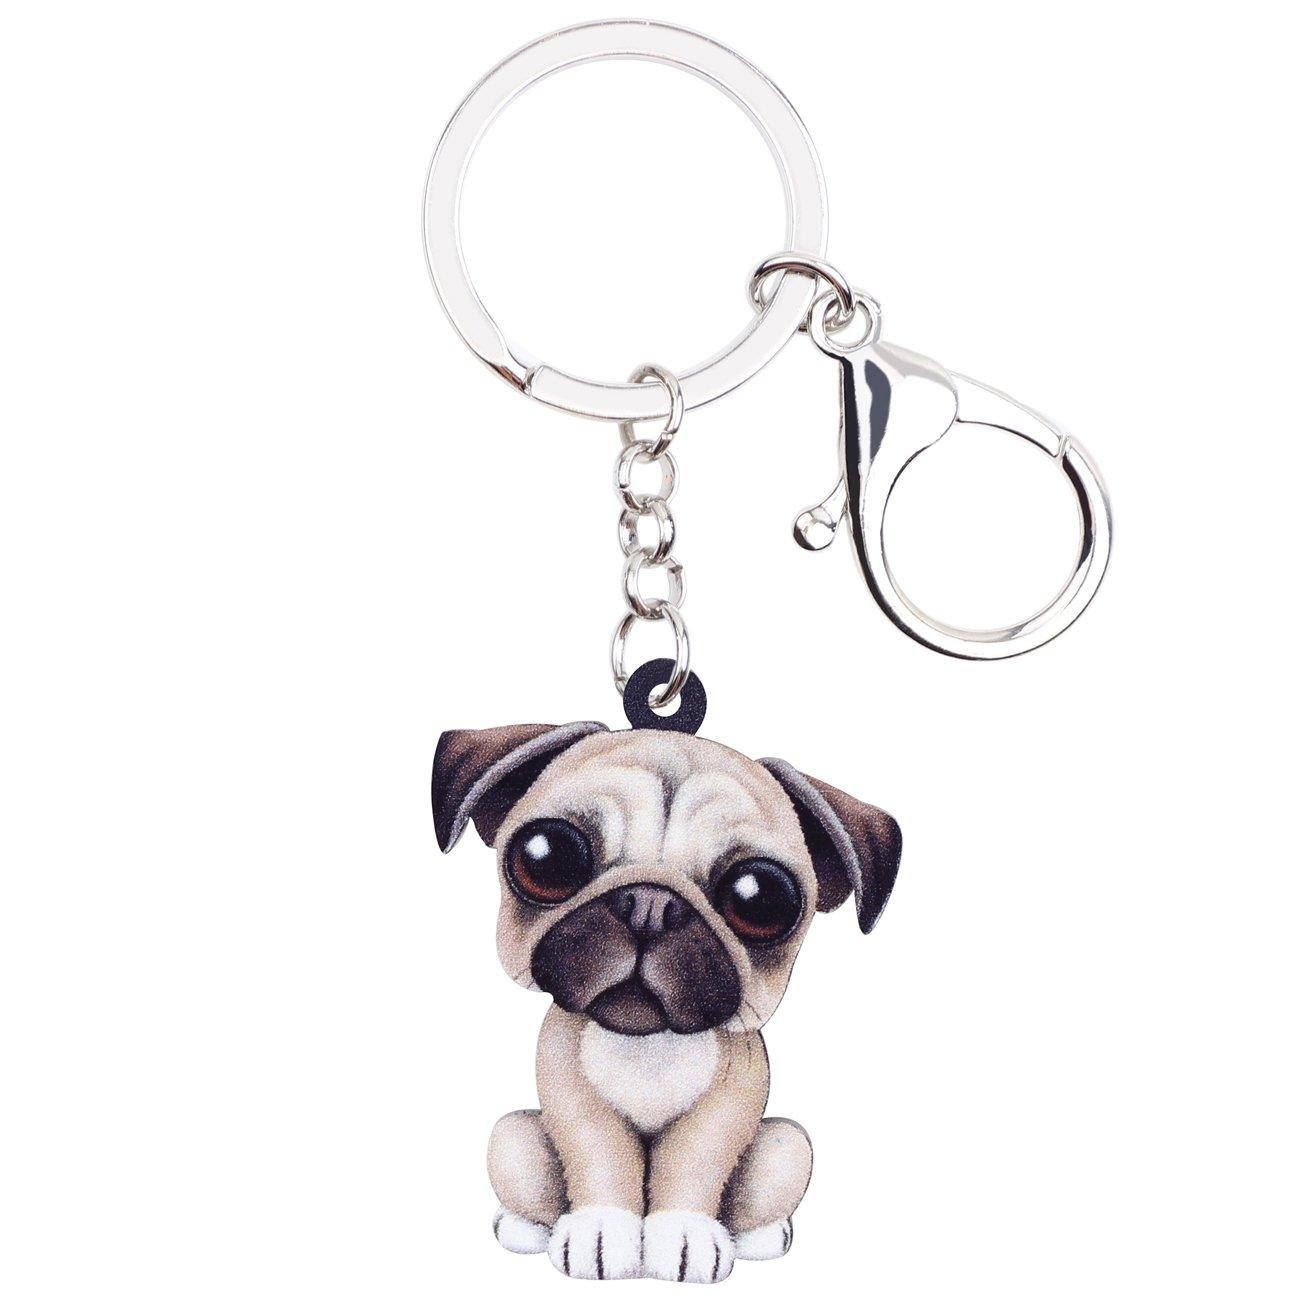 BONSNY Patterned Acrylic French Bulldog Pug Dog Keychains For Women Kids Car Key Rings Charms